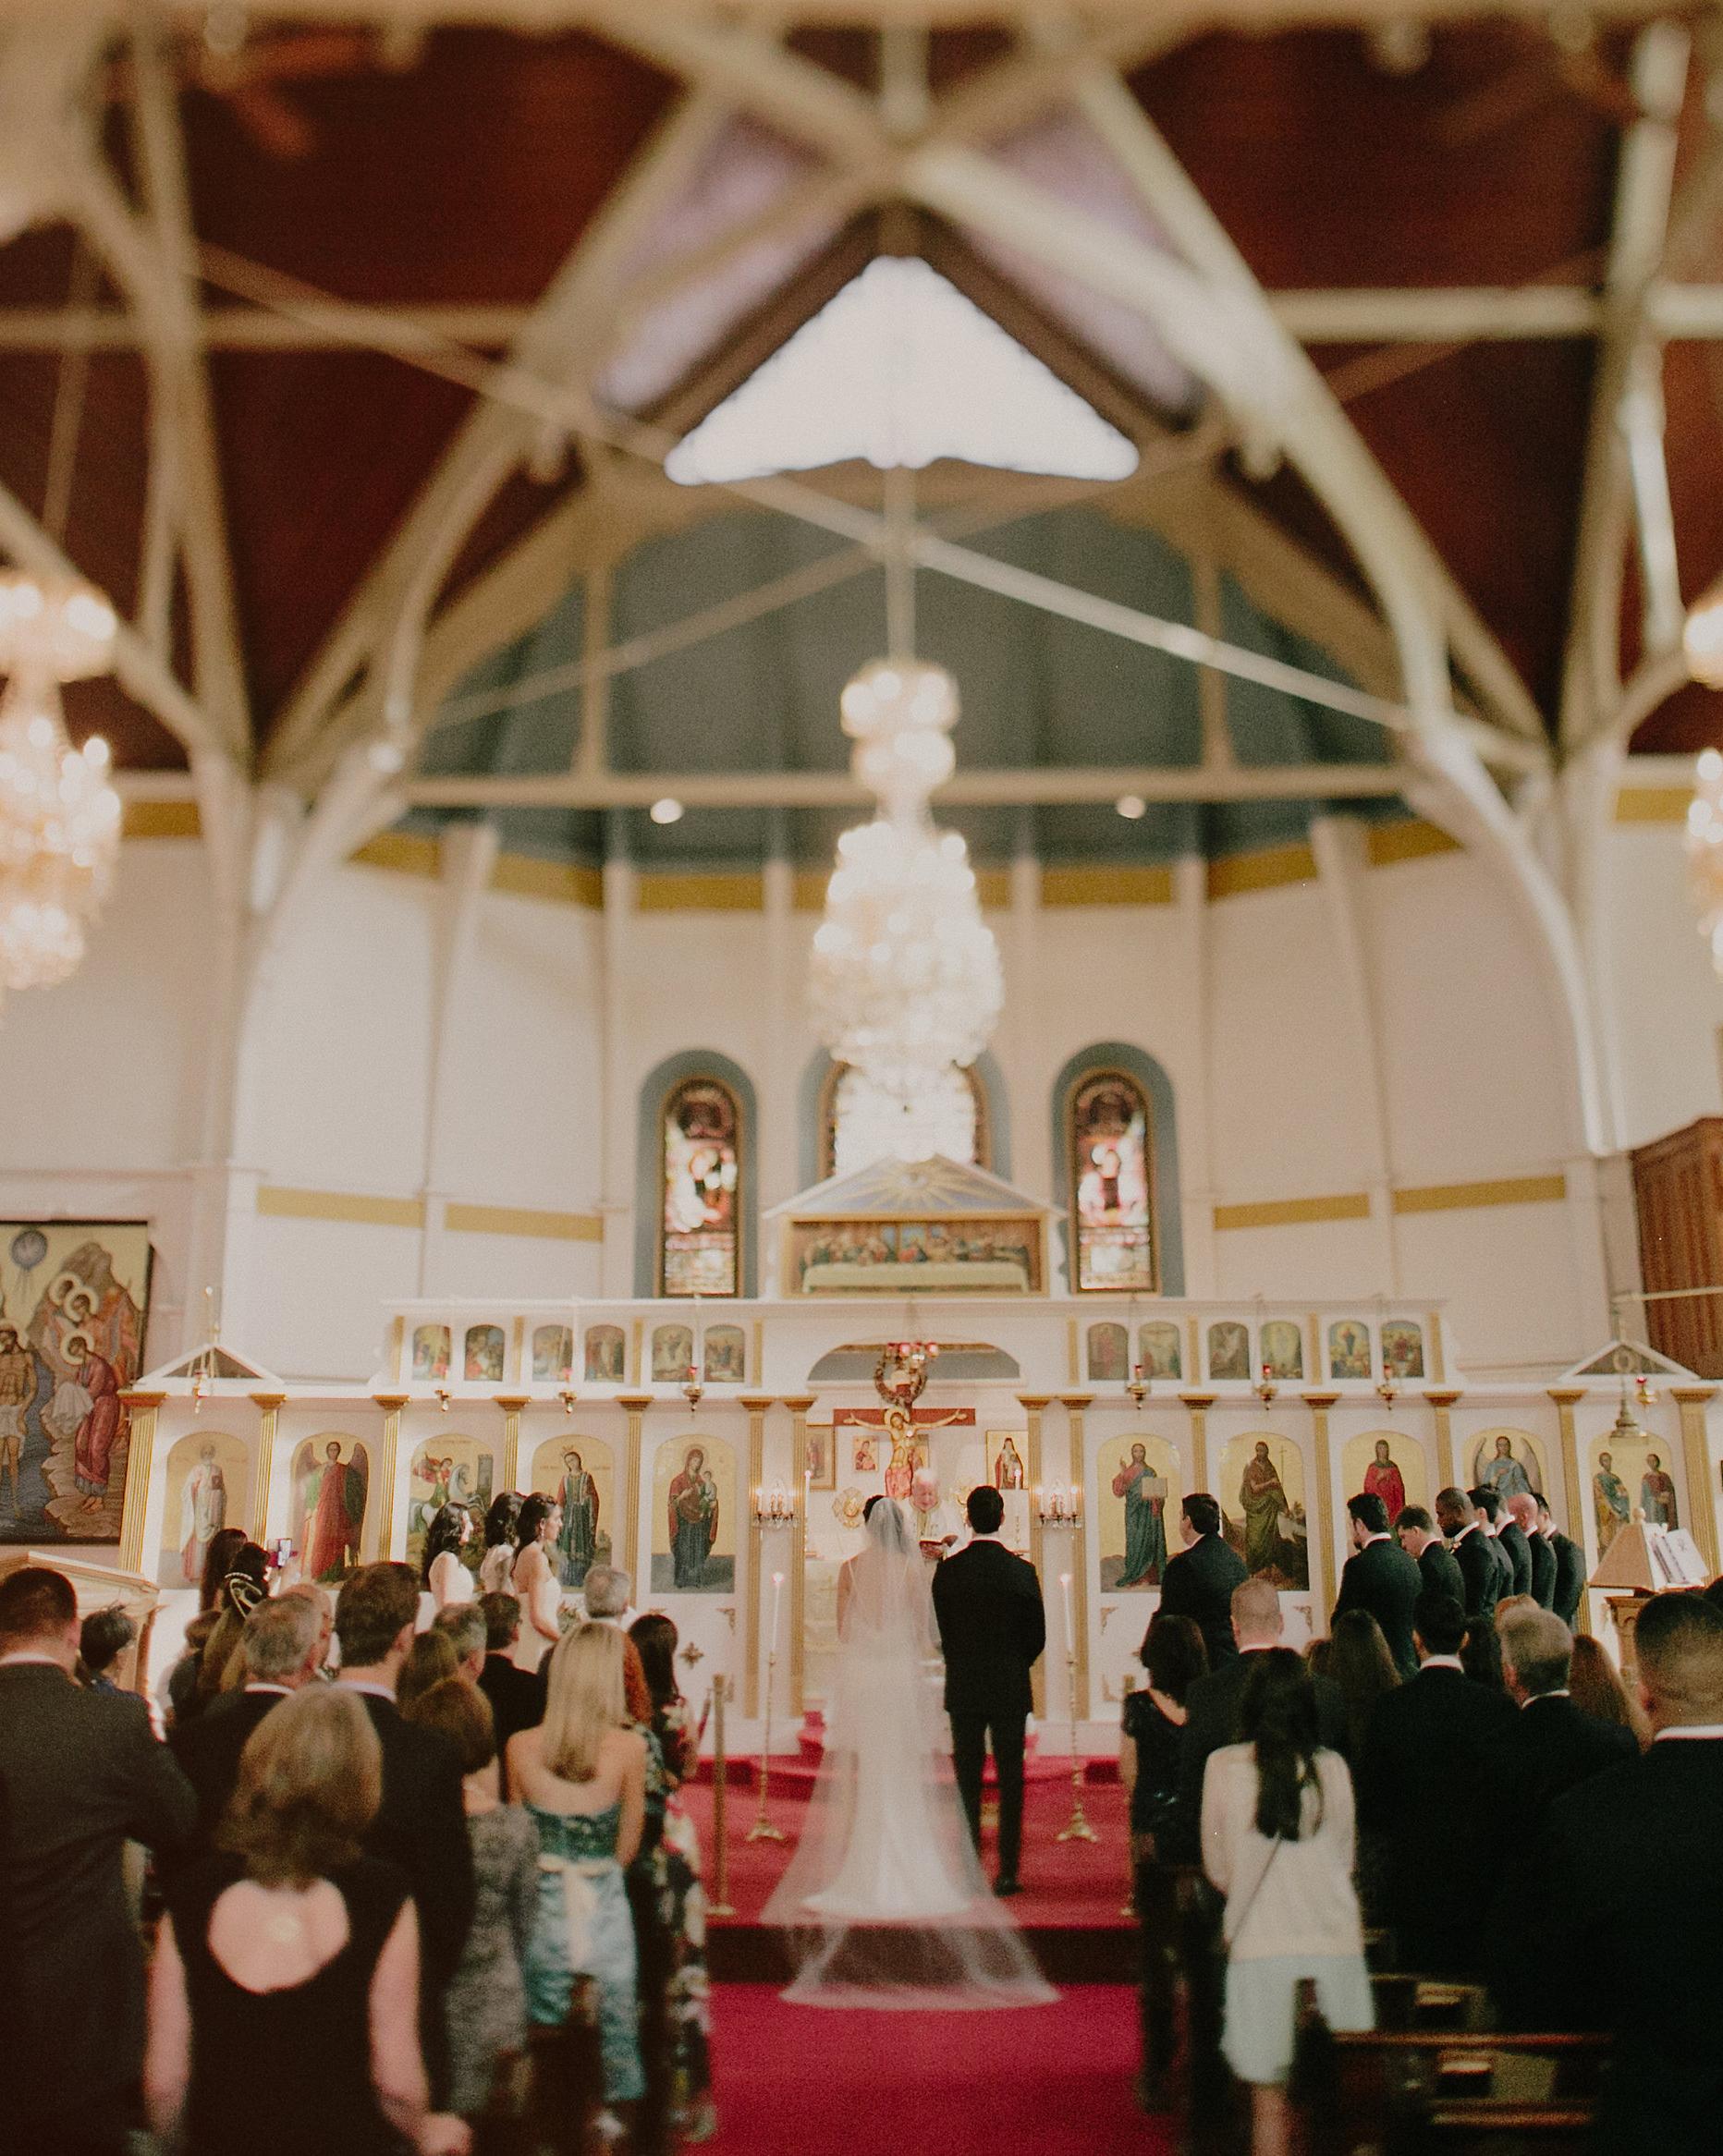 rosie-constantine-wedding-ceremony-132-s112177-1015.jpg